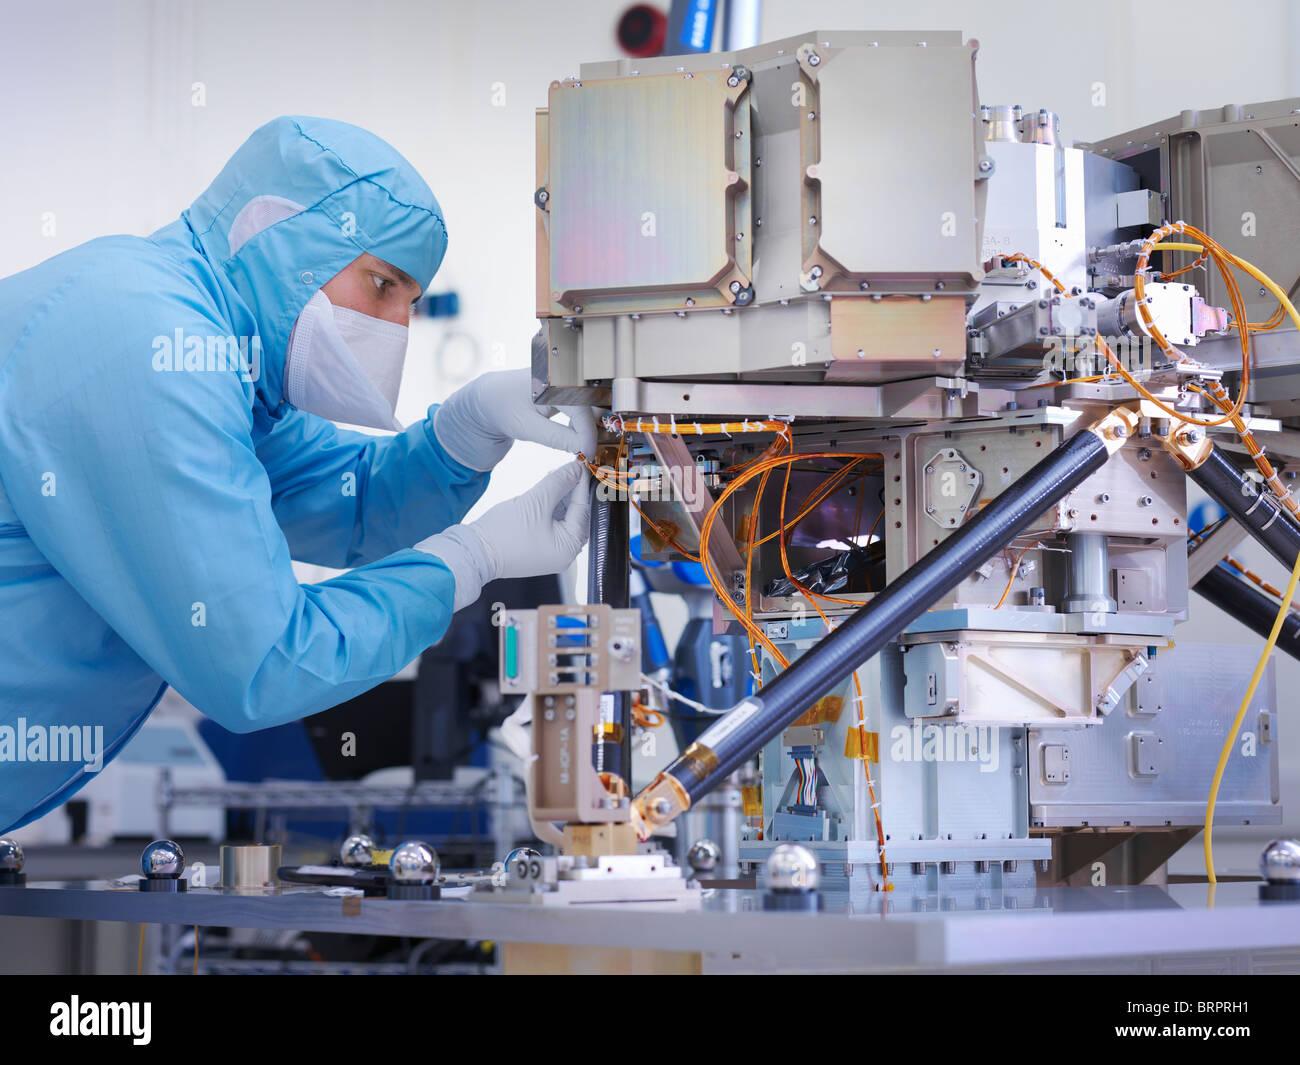 Worker building satellite dish - Stock Image